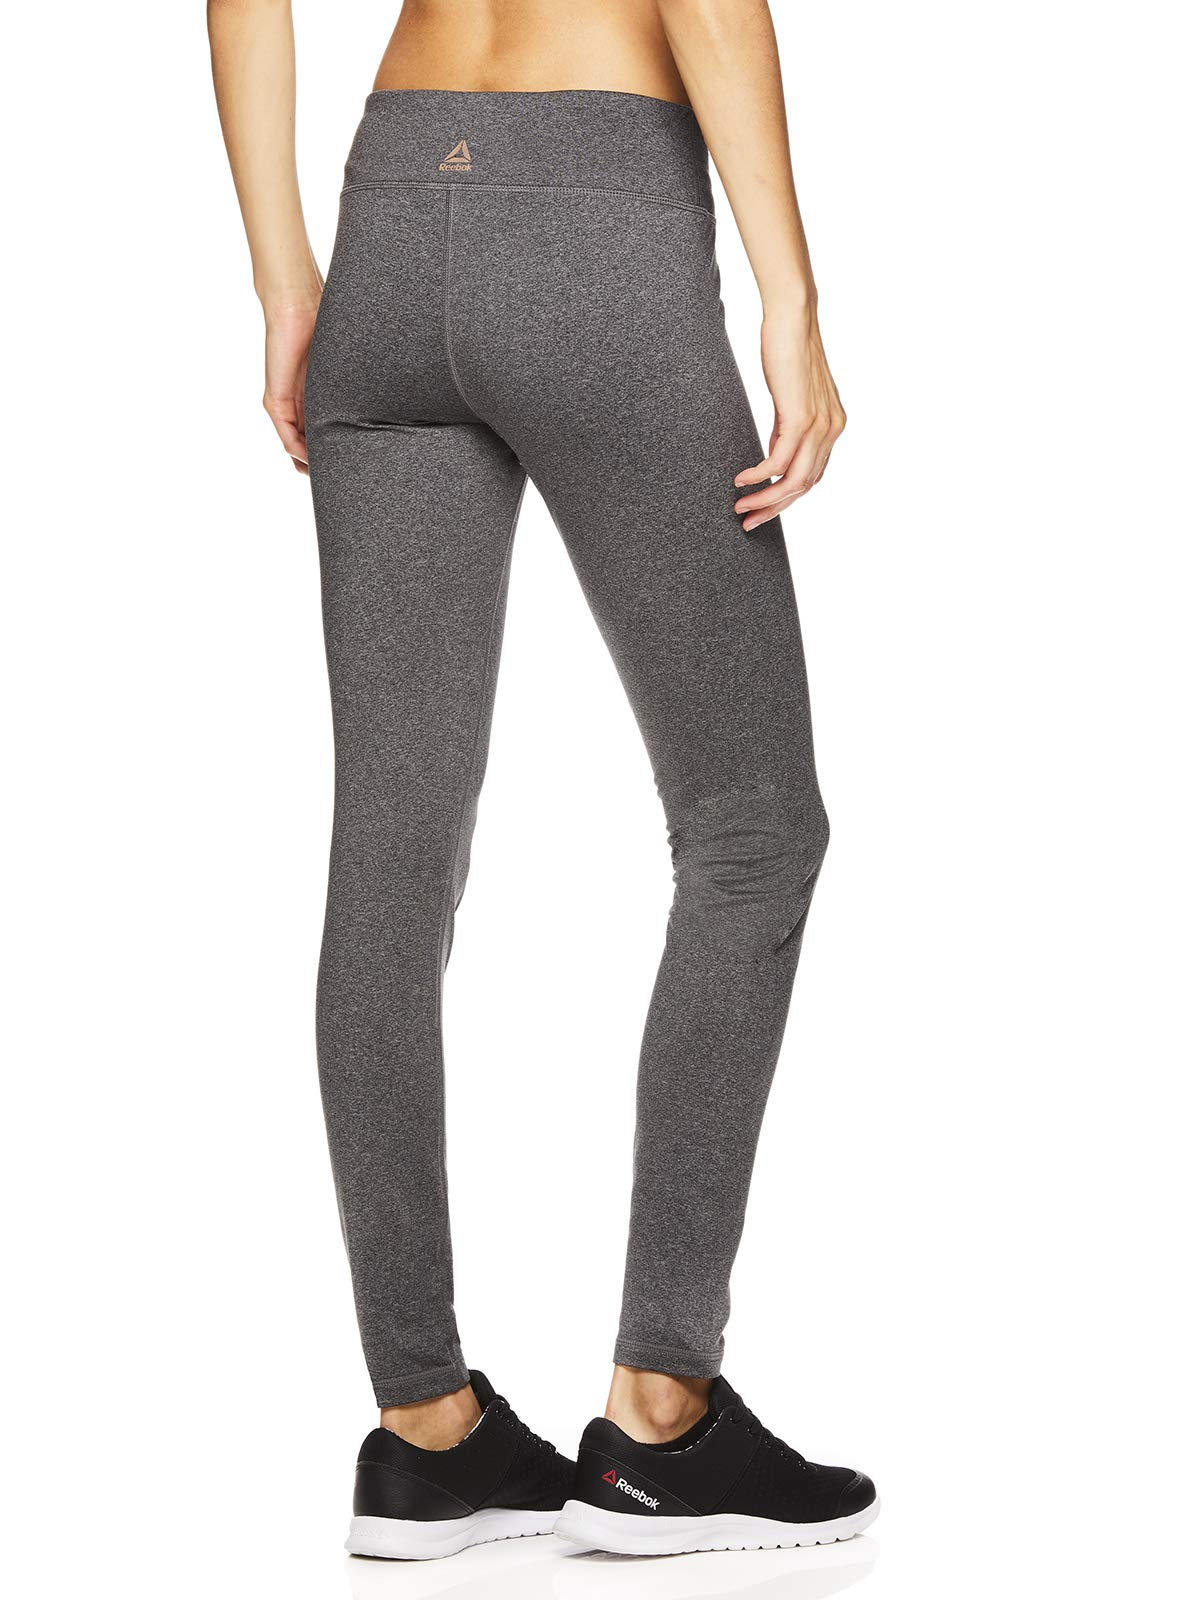 Reebok Women's Fleece Lined Legging - Full Length Performance Compression Workout Pants